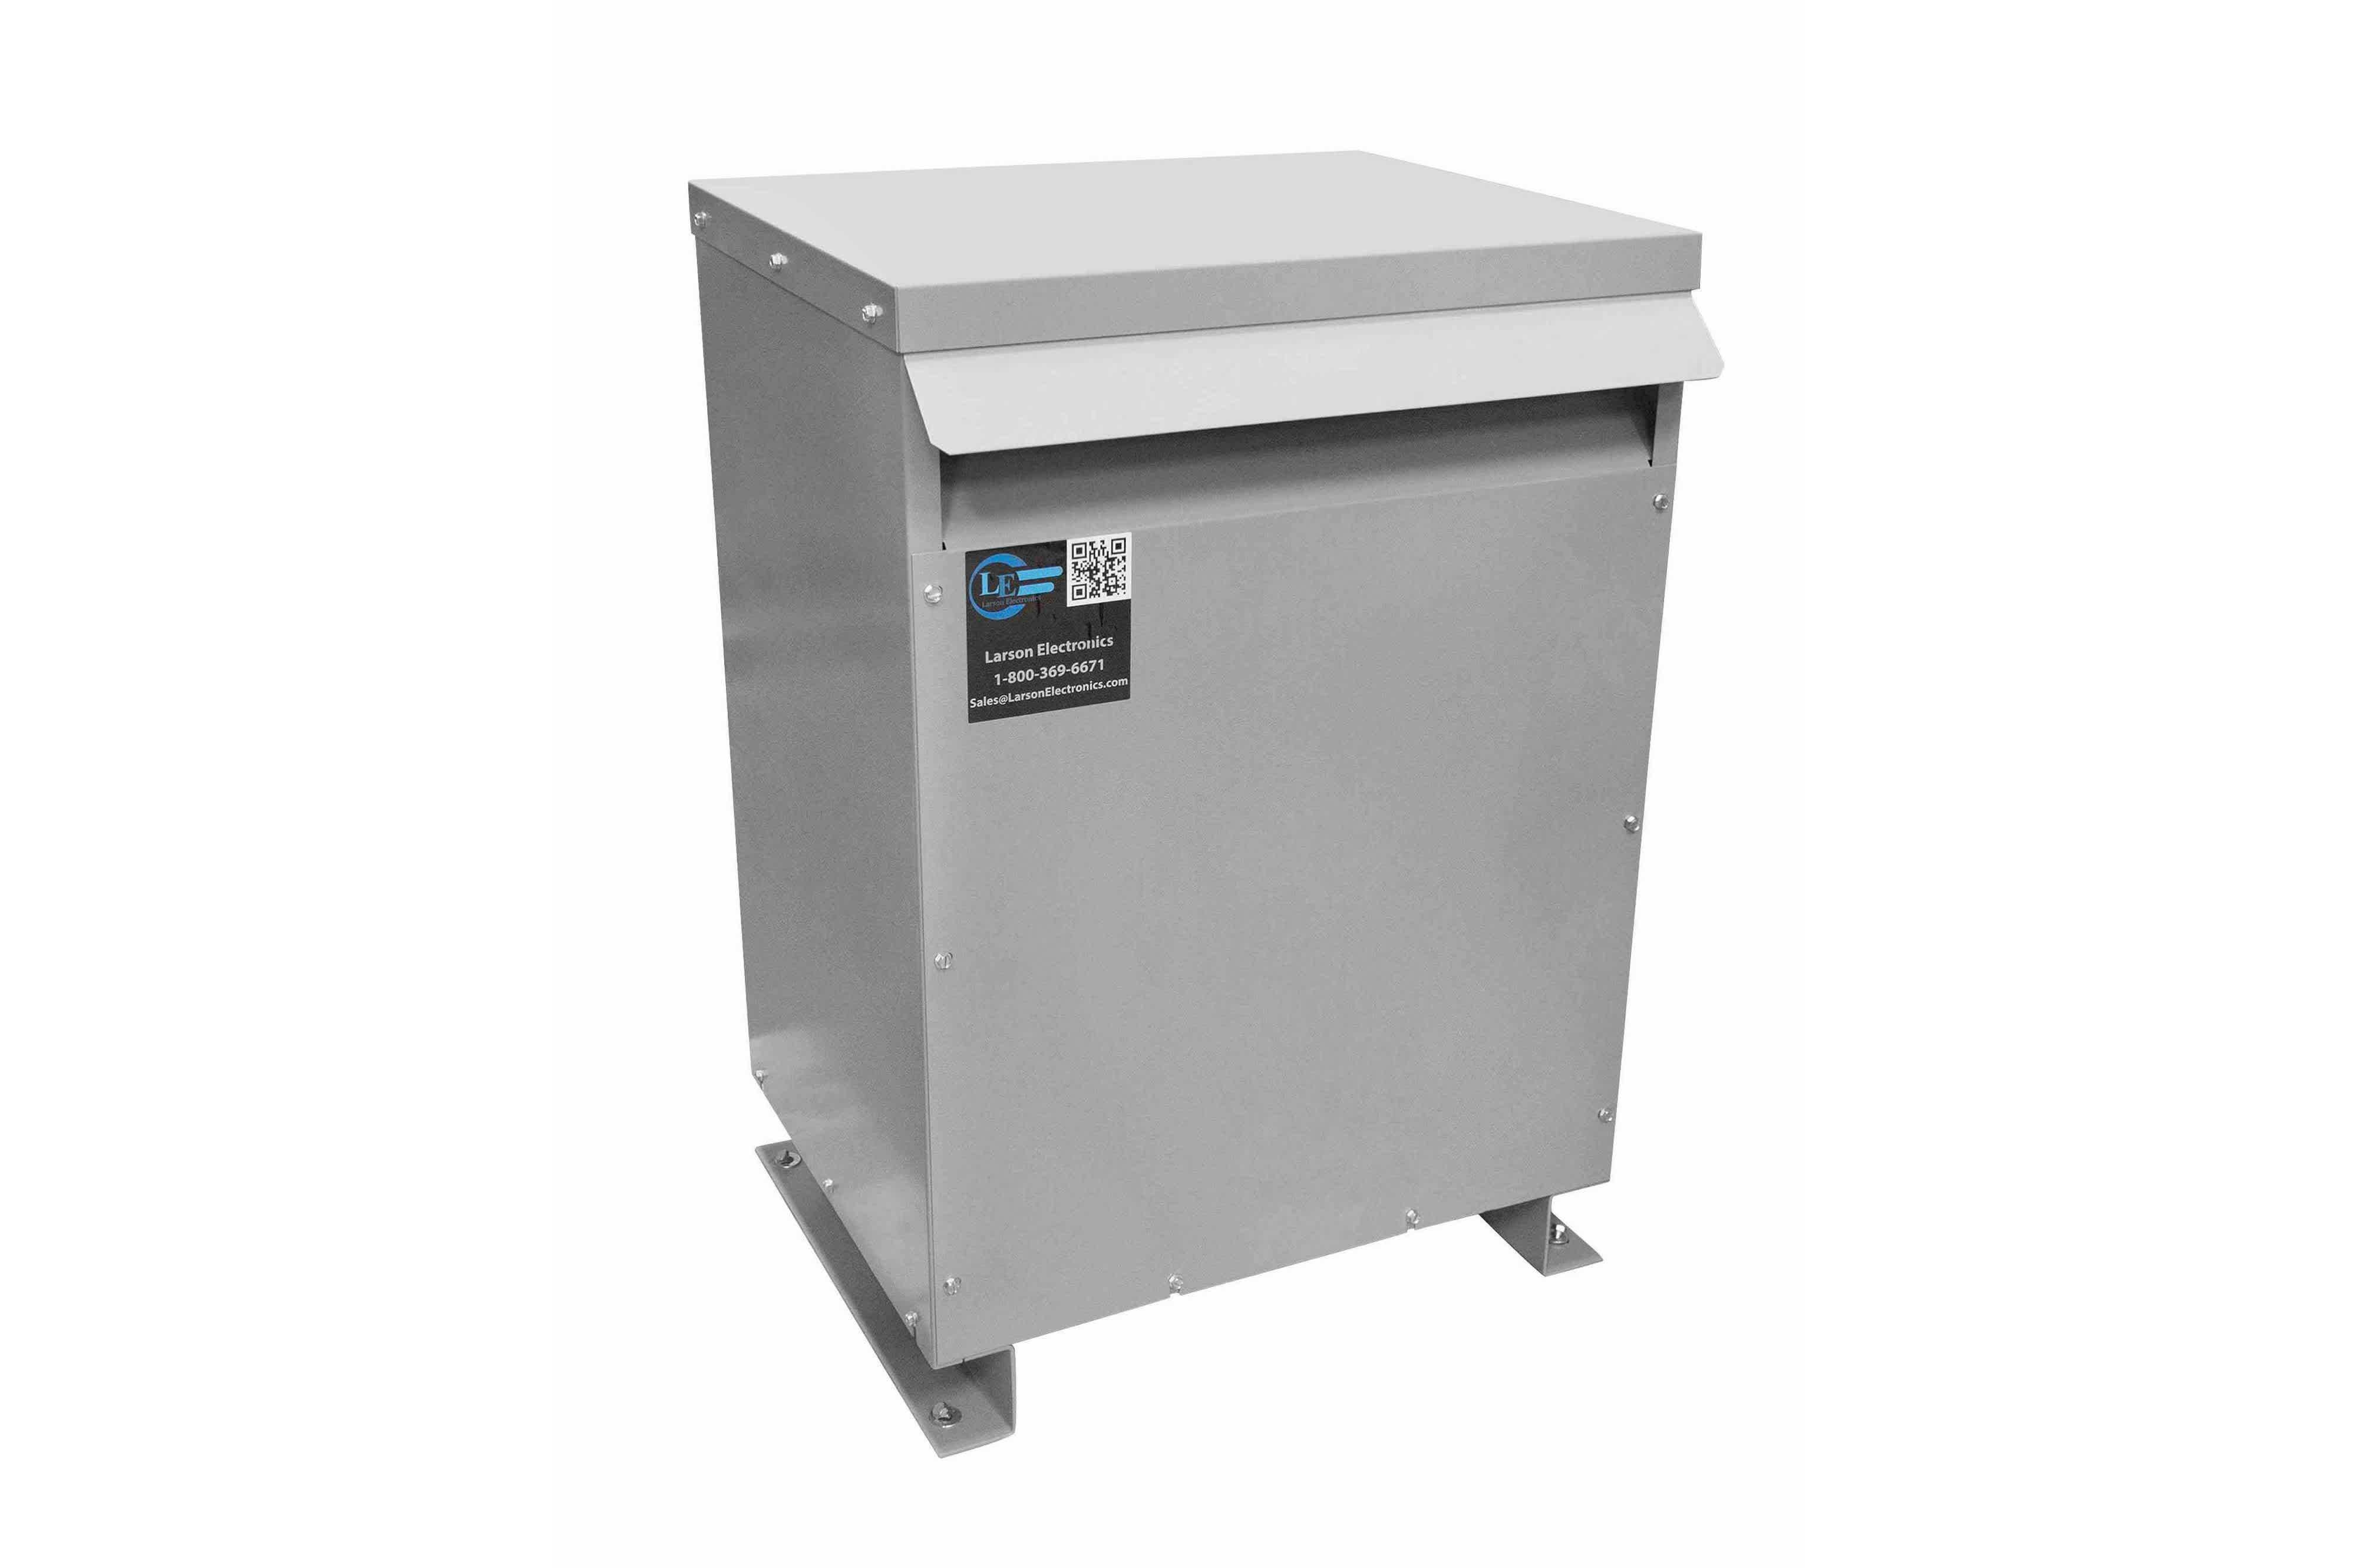 200 kVA 3PH DOE Transformer, 400V Delta Primary, 480Y/277 Wye-N Secondary, N3R, Ventilated, 60 Hz